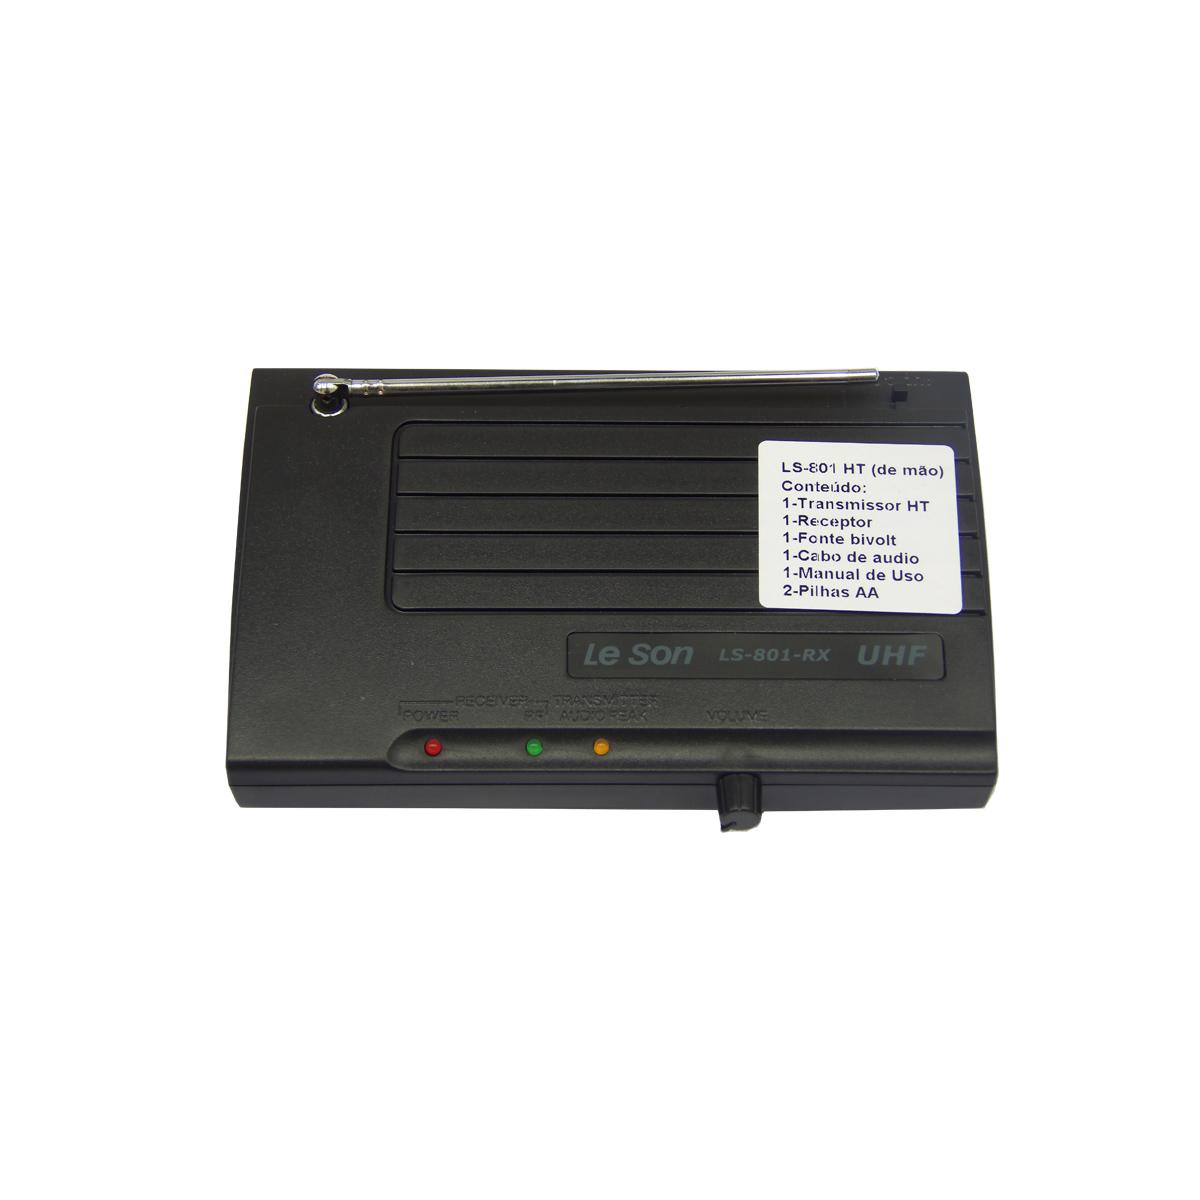 LS801HT - Microfone s/ Fio de Mão UHF LS 801 HT - Le Son